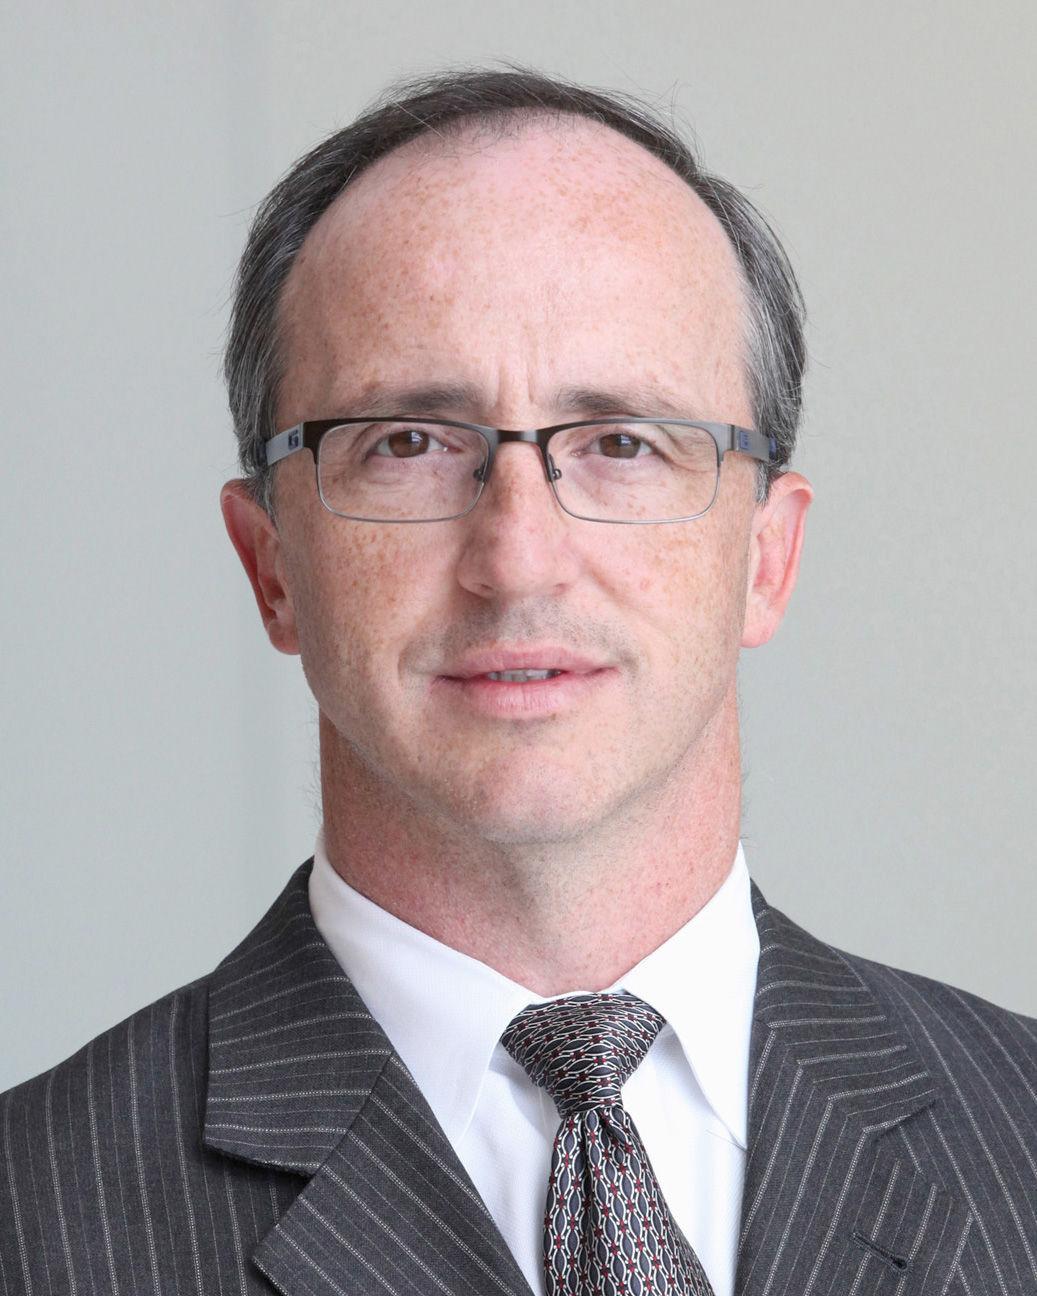 Headshot image for Dr. John Pollina